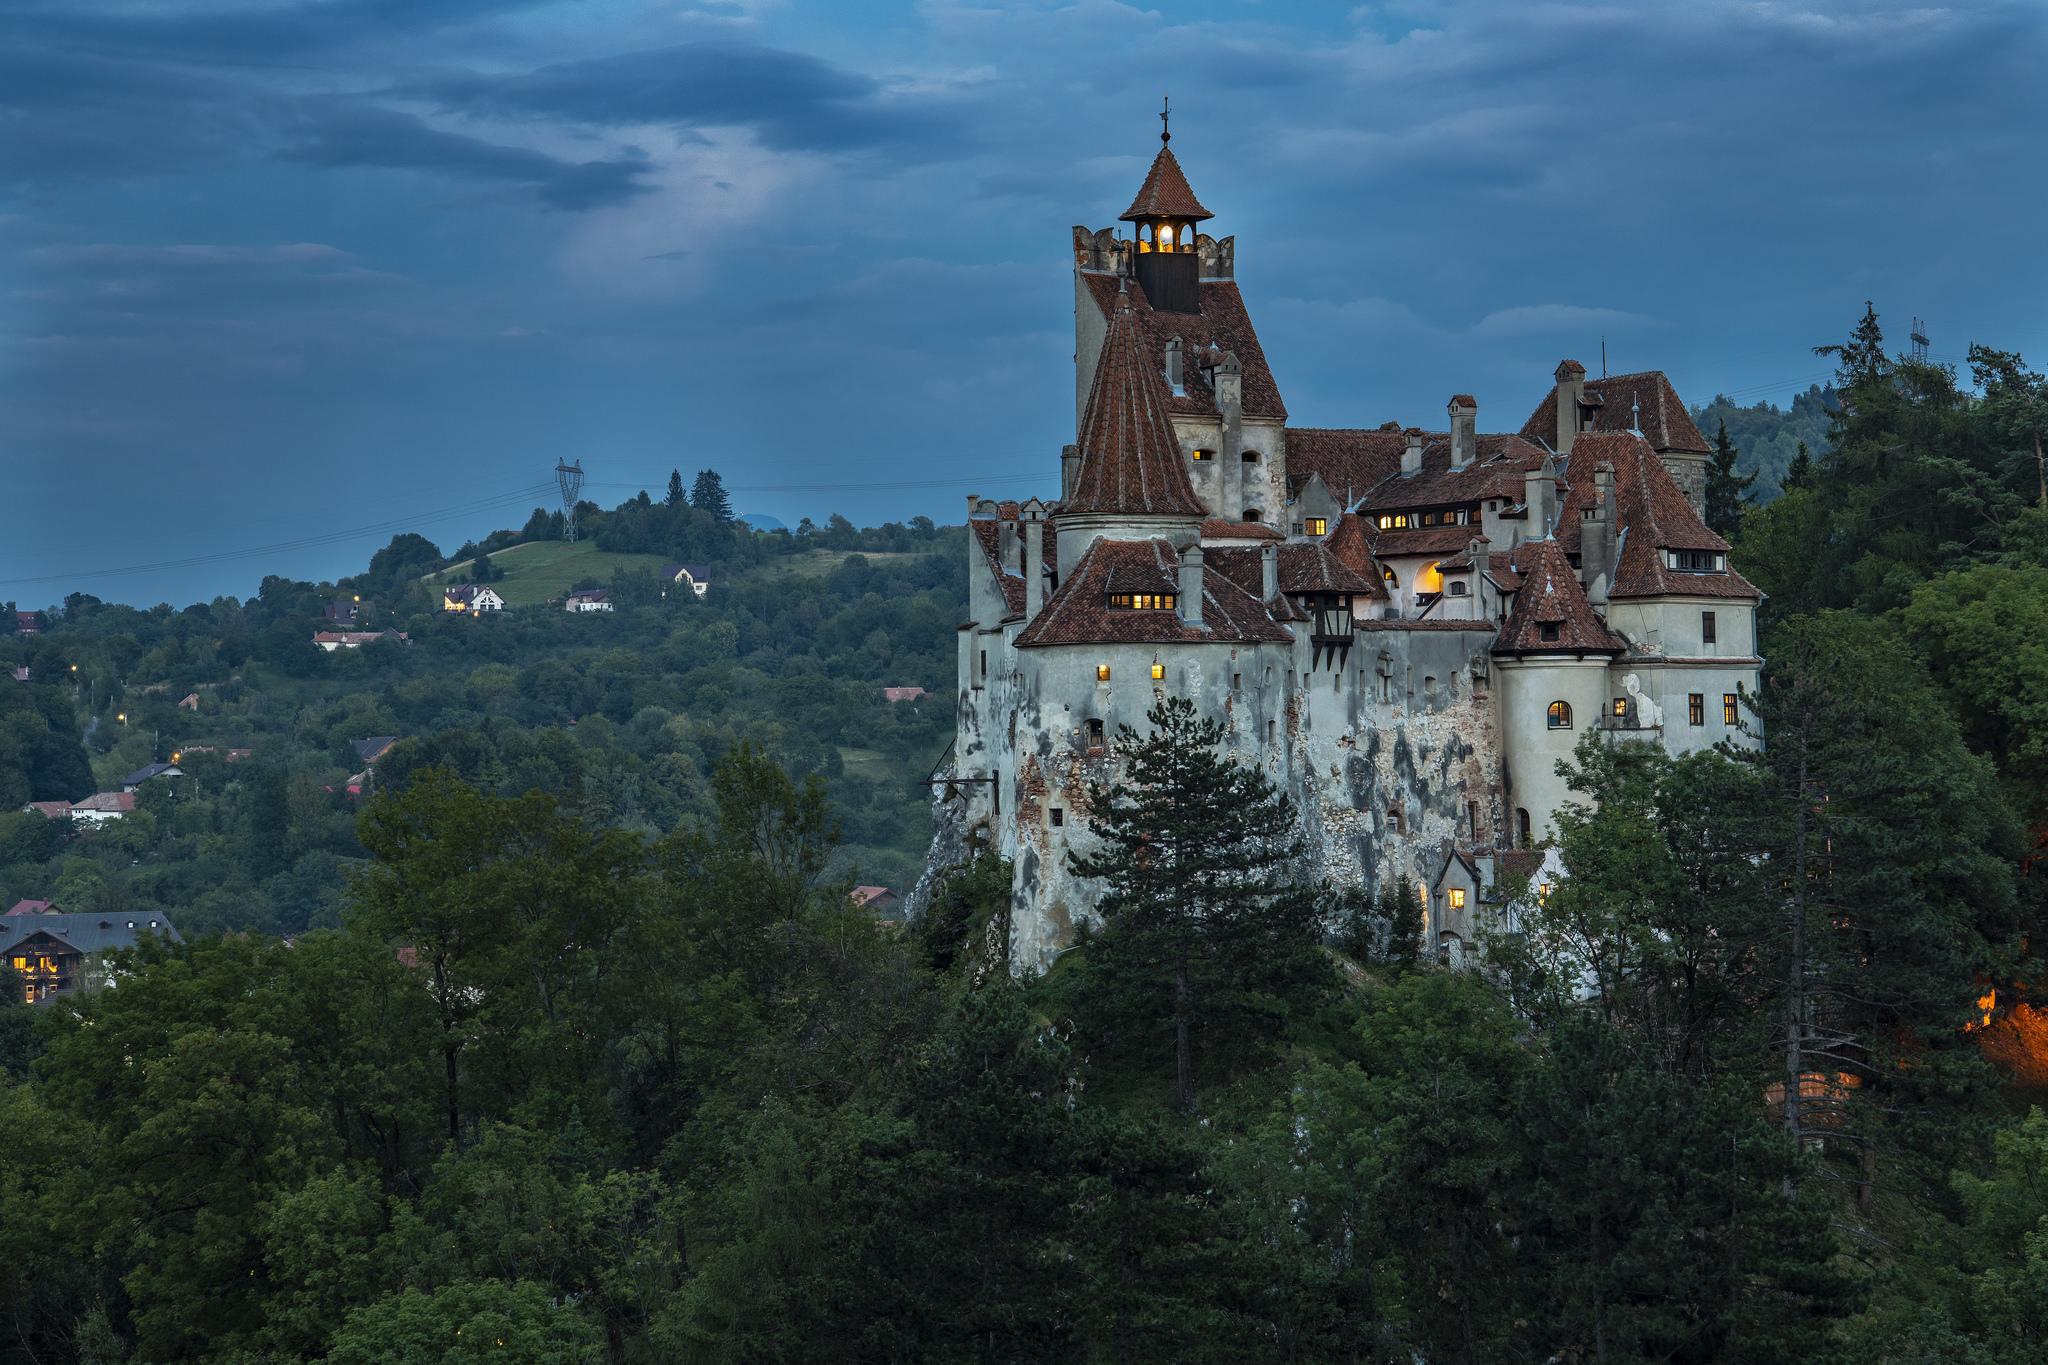 Dracula's Castle - Bran Castle (Bran, Romania)